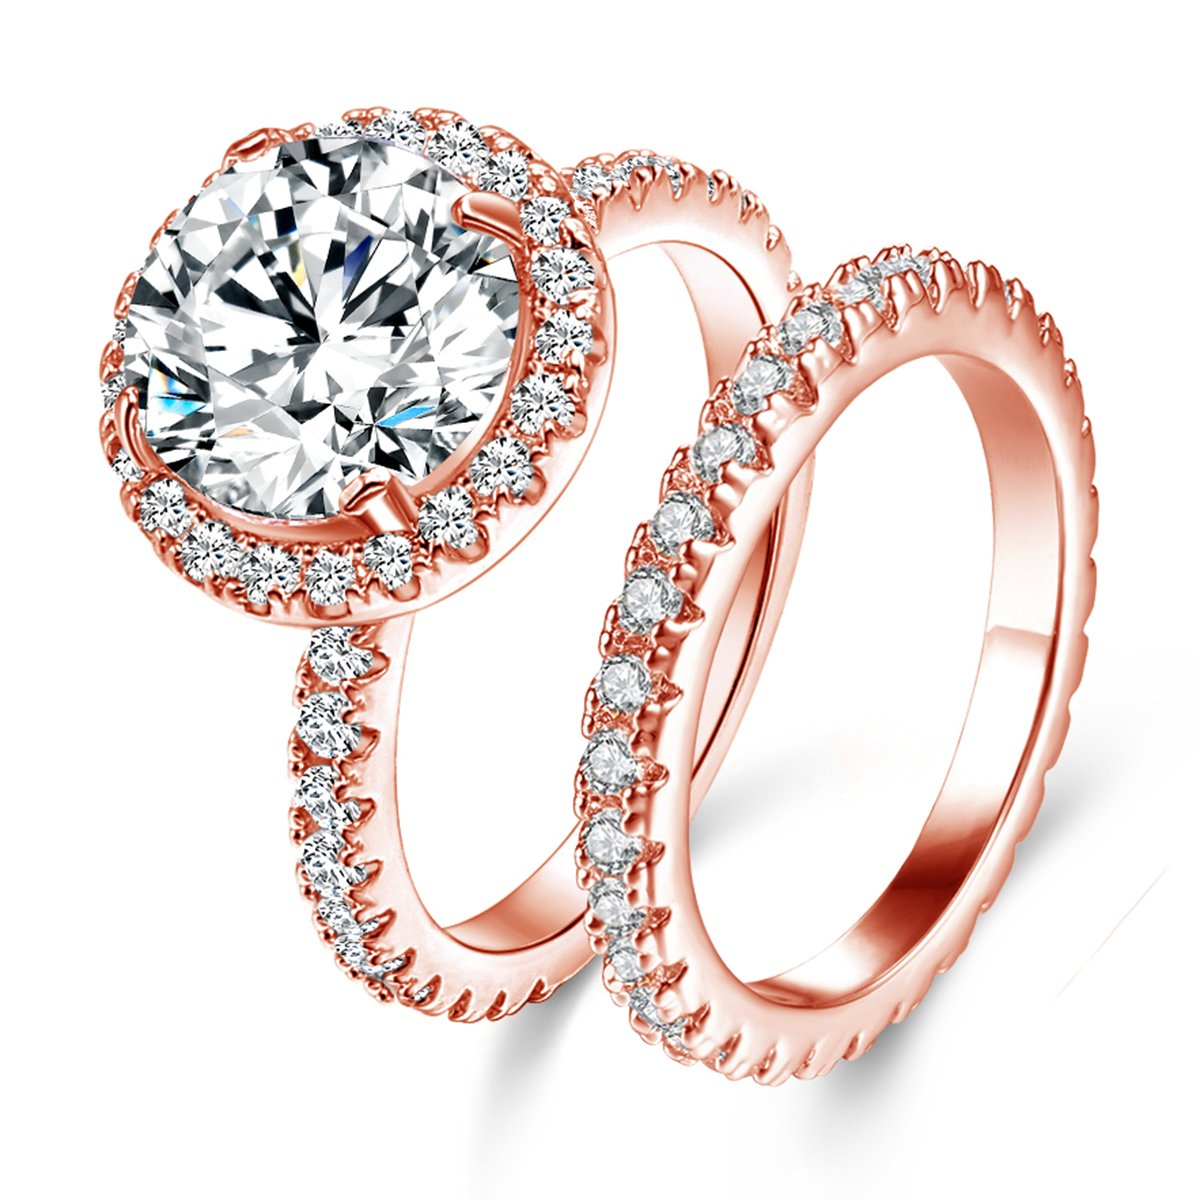 Jiangyue Women Halo Big Stone Rings AAA Cubic Zirconia Rose Gold Plated 2PCS Set Brilliant ElegantRing Party Jewelry Size 6